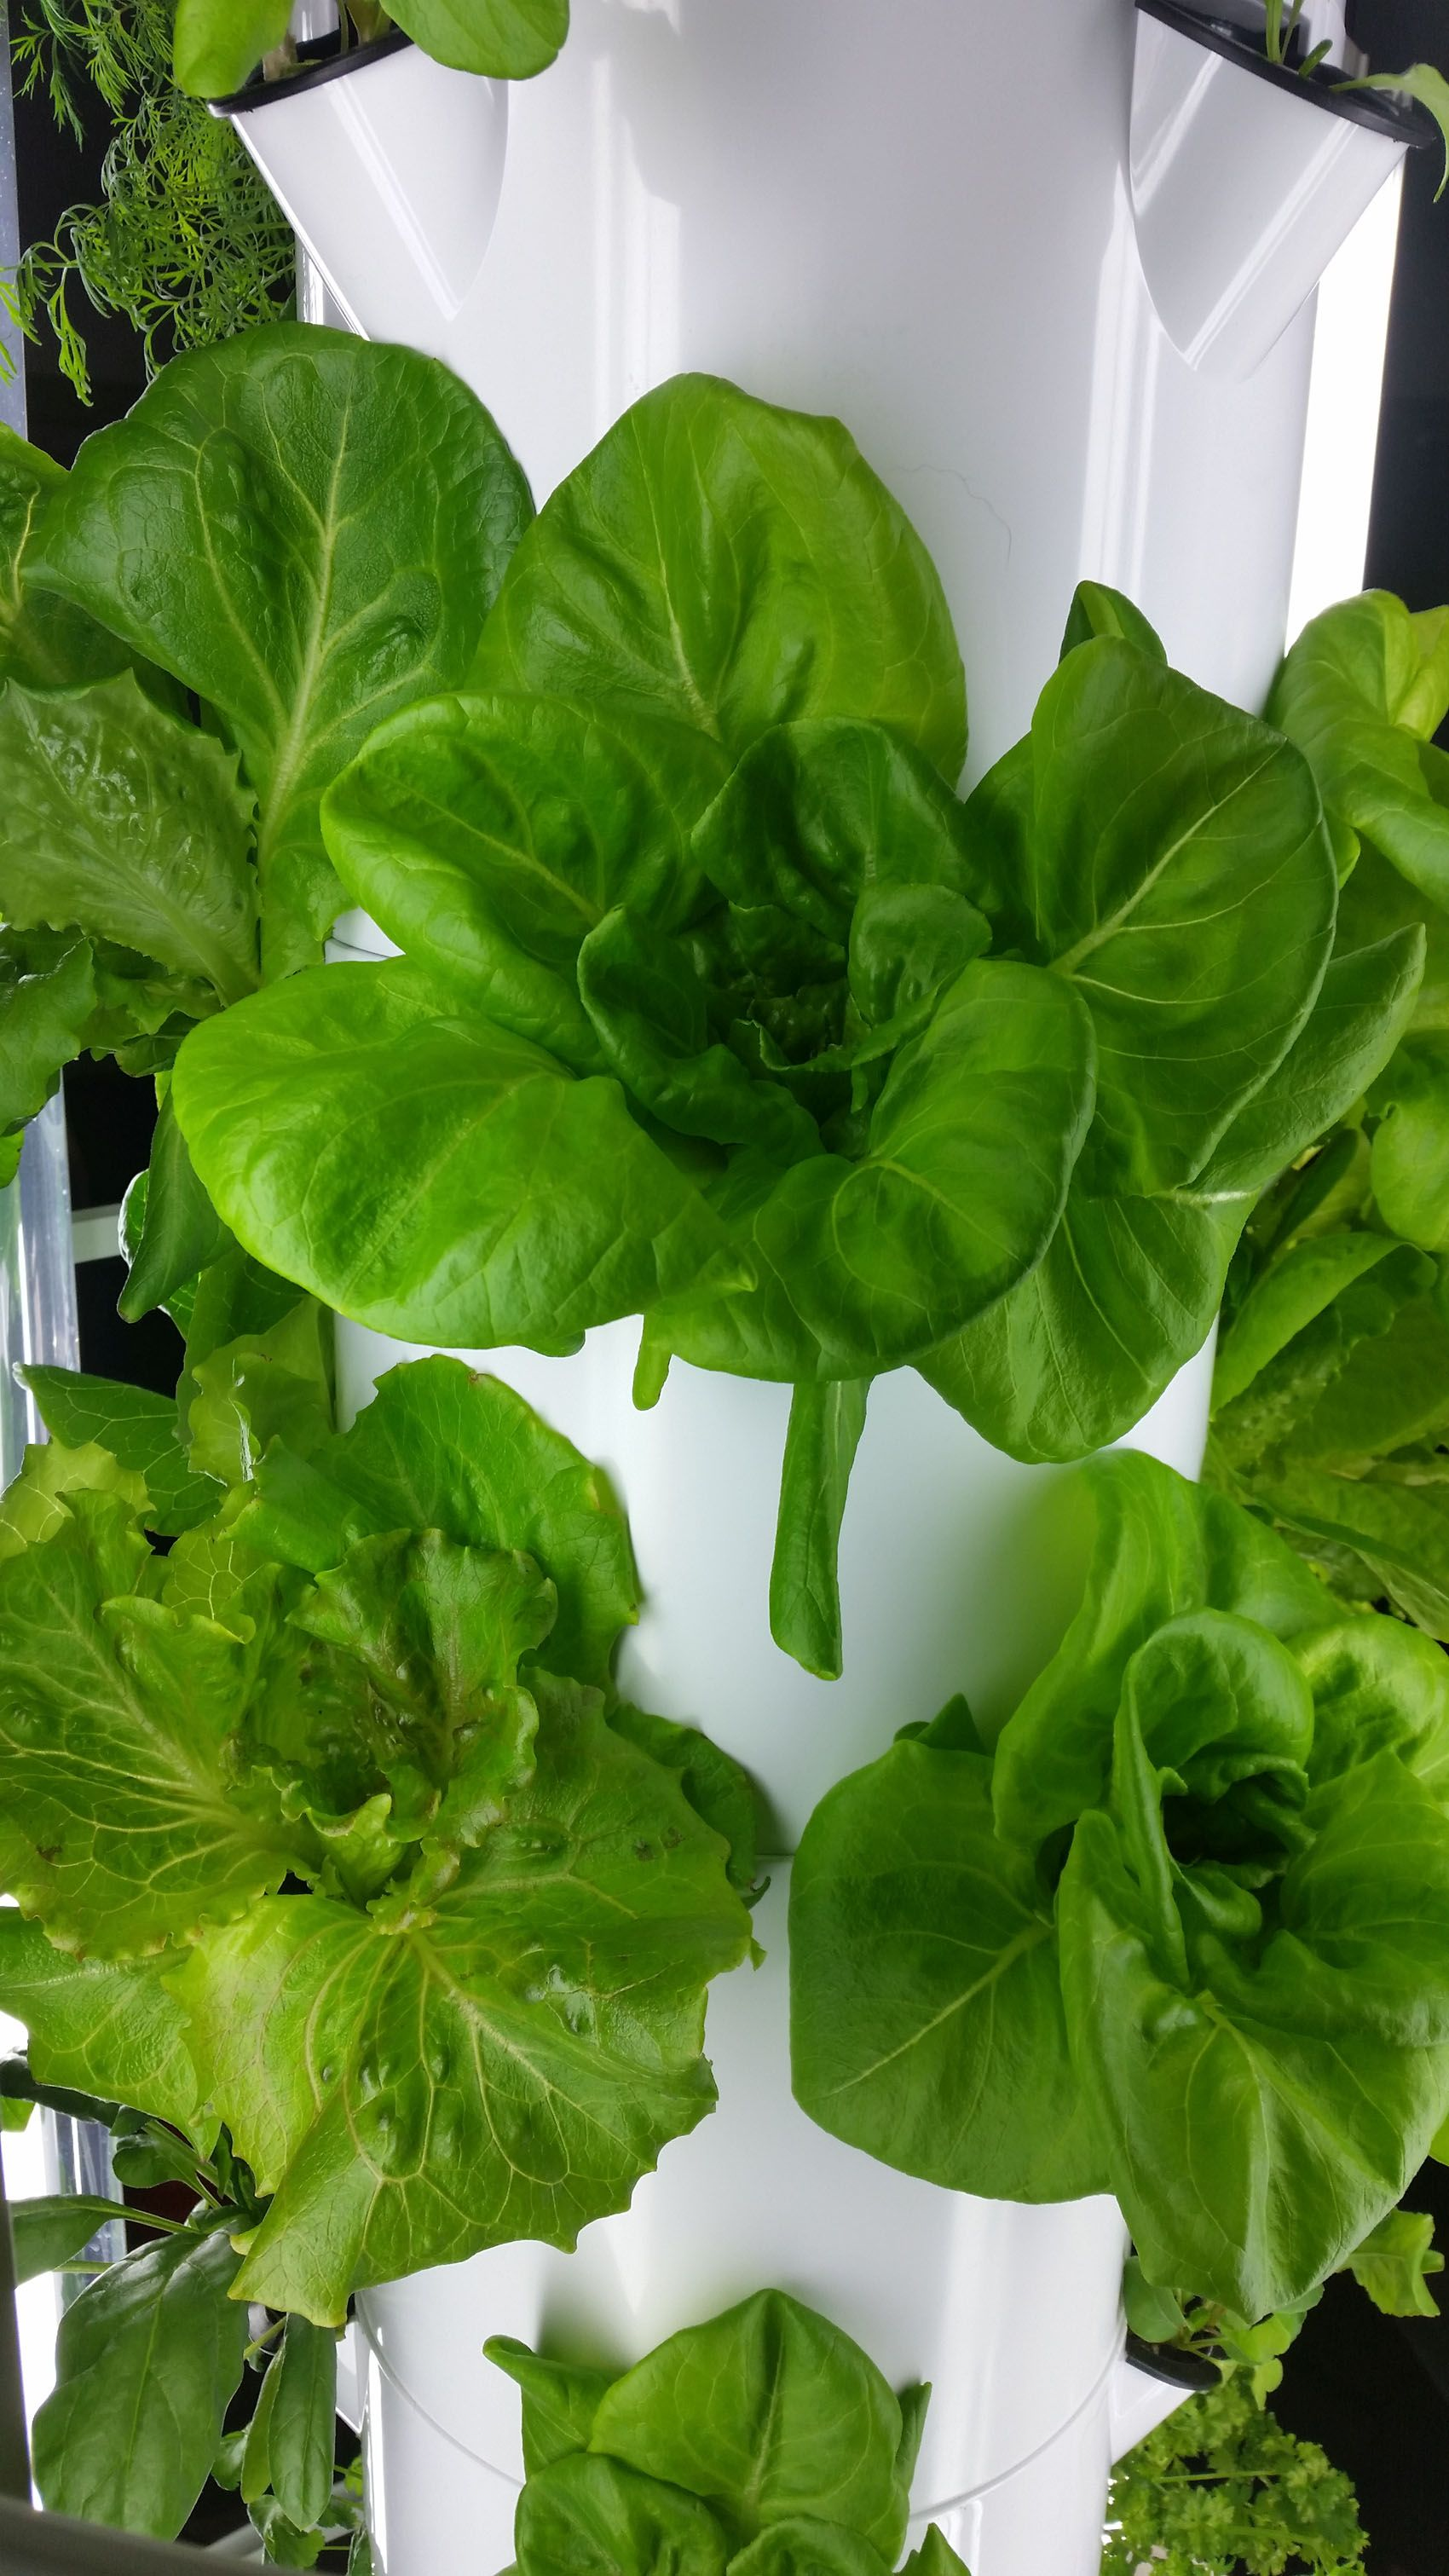 tower garden bibb lettuce leafy greens grown indoors in the